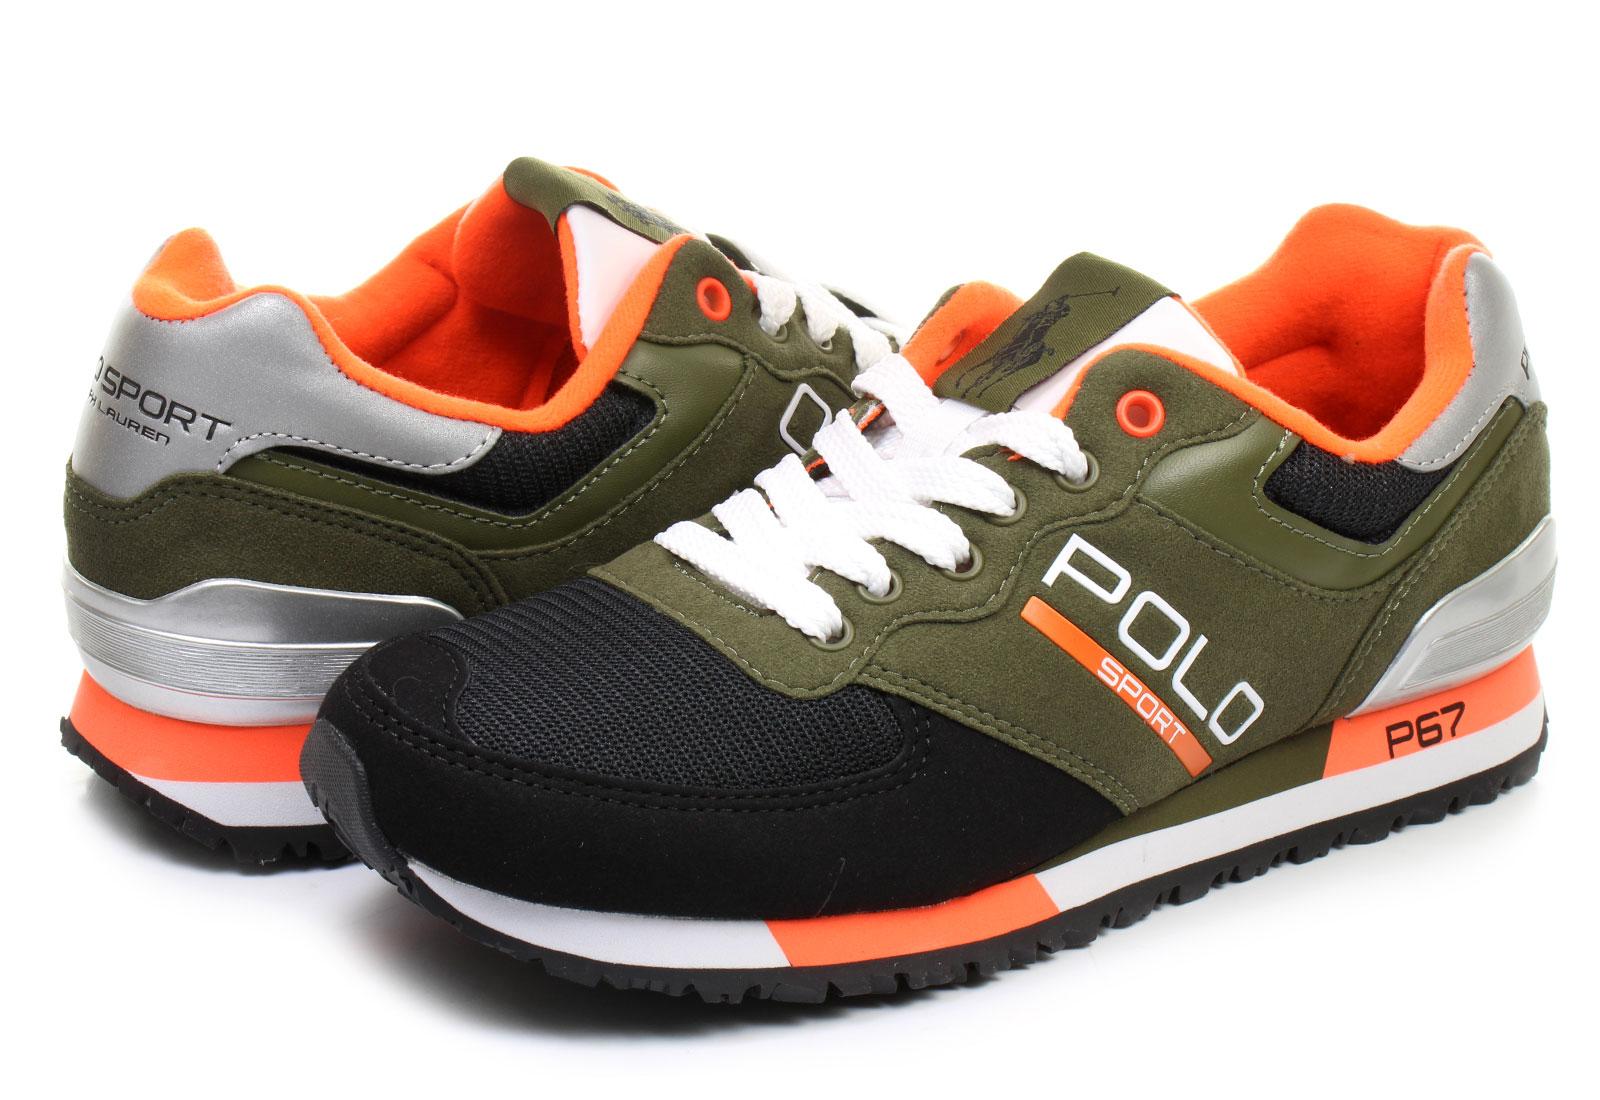 Polo Ralph Lauren Cipő - Slaton Polo - APP4-R-W3EOM - Office Shoes ... ae612facf6